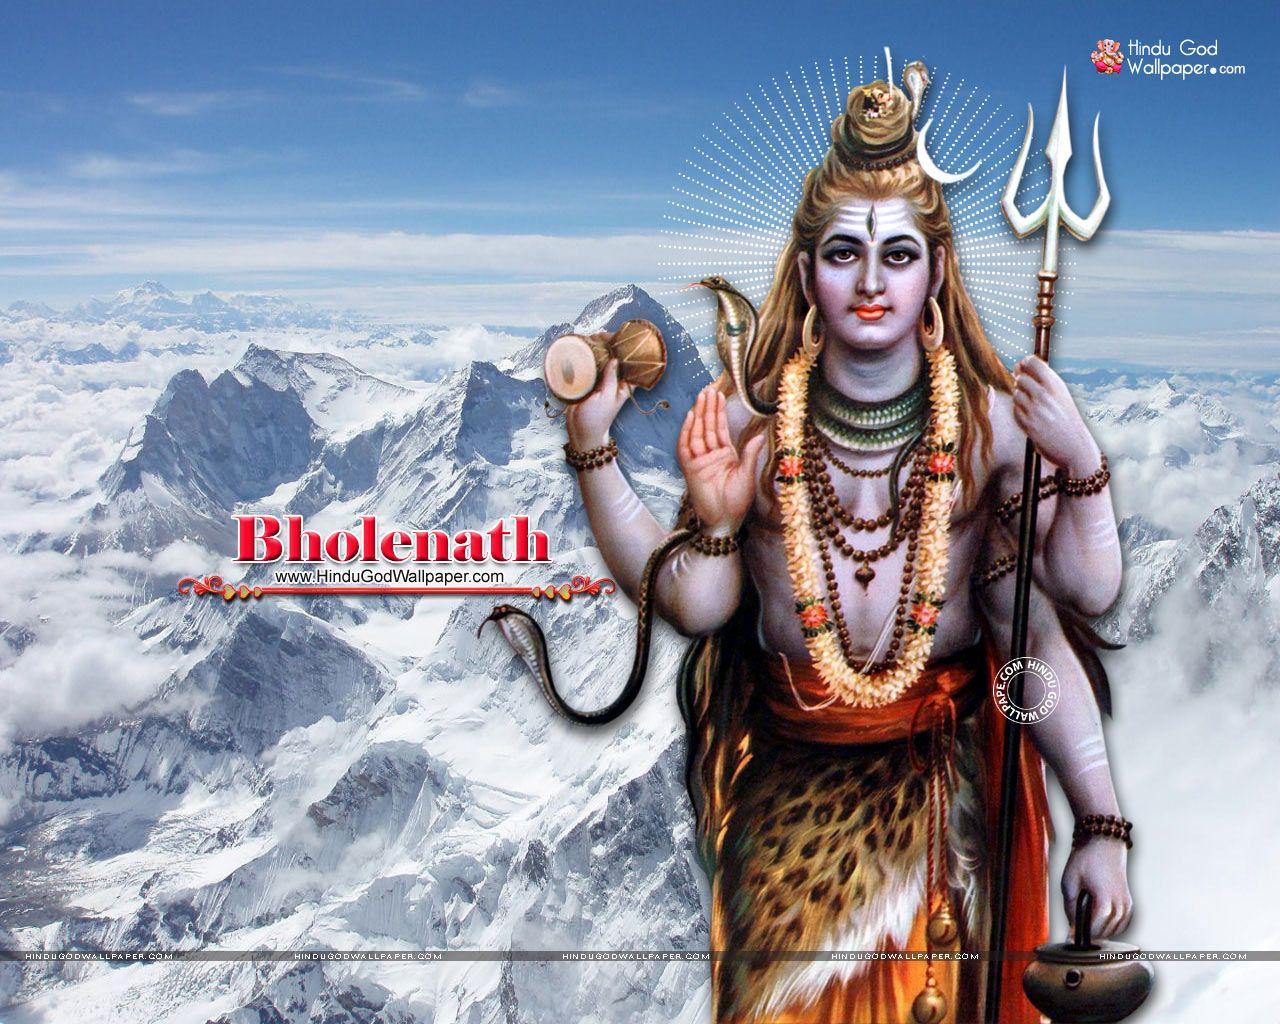 Hd wallpaper bholenath - Bholenath Hd Wallpapers Images Photos Free Download